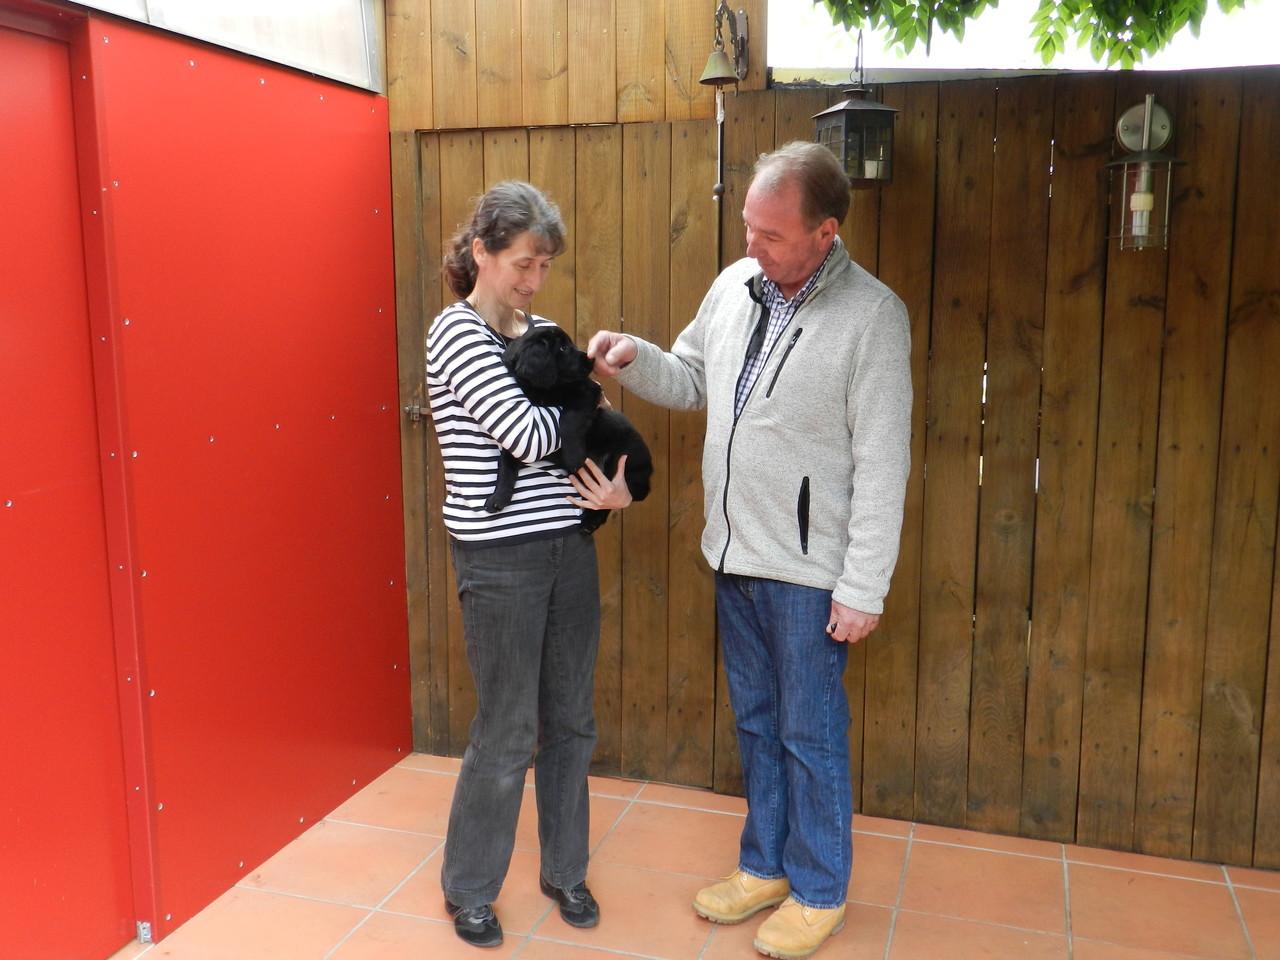 Dajela zieht zu Michaela u. Achim nach Kirchheim/Teck